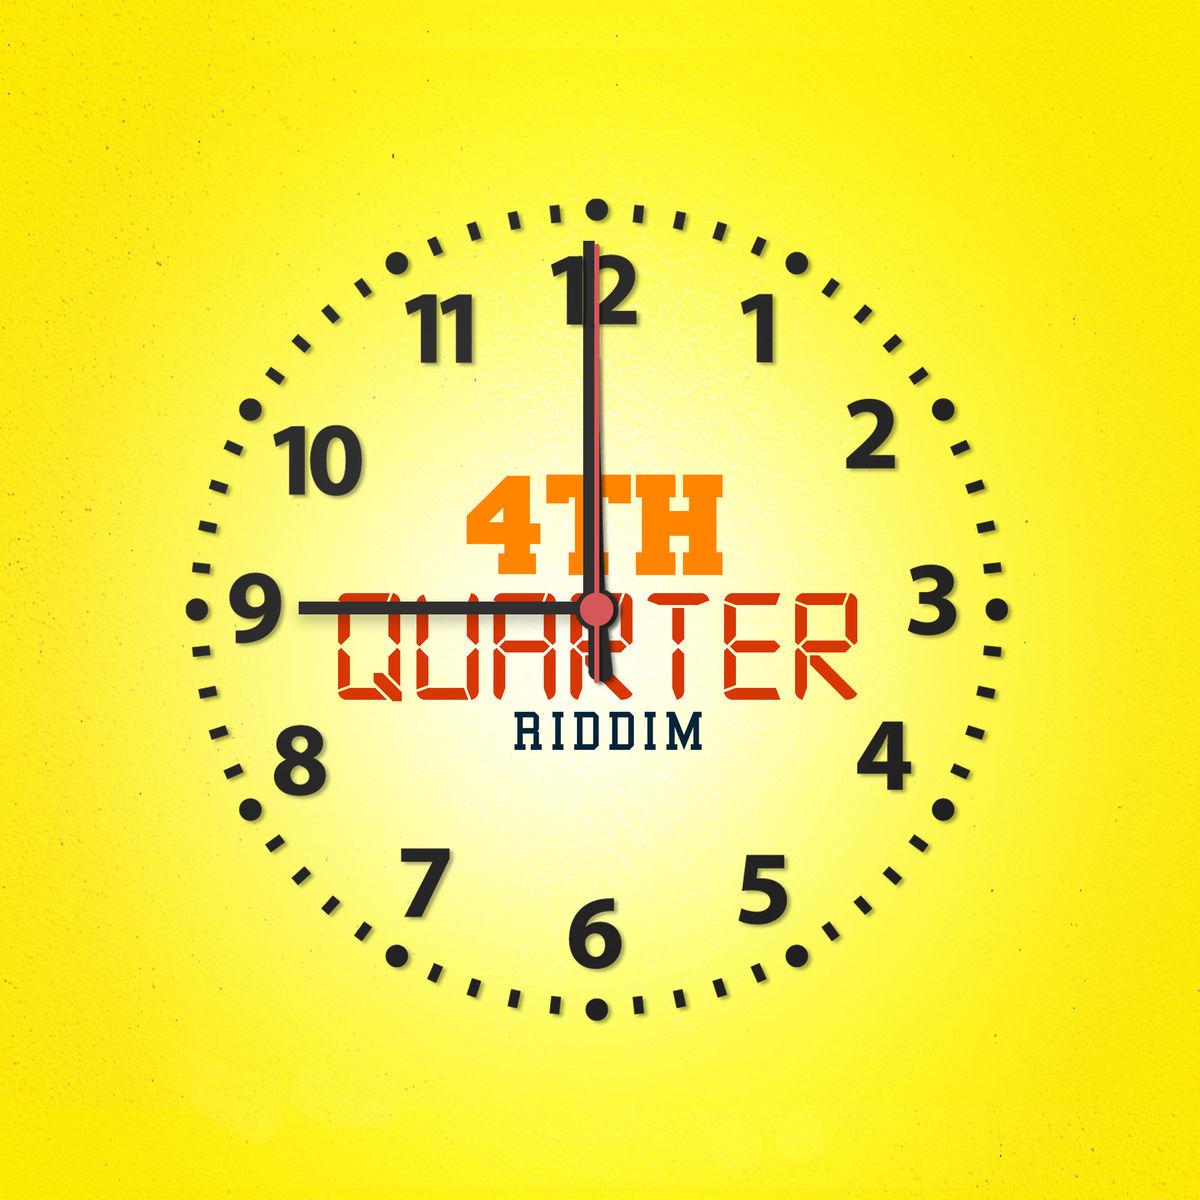 4TH QUARTER RIDDIM [PROMO] 2019 - NINE MIND _ LENKY RECORDS ~ Reggae